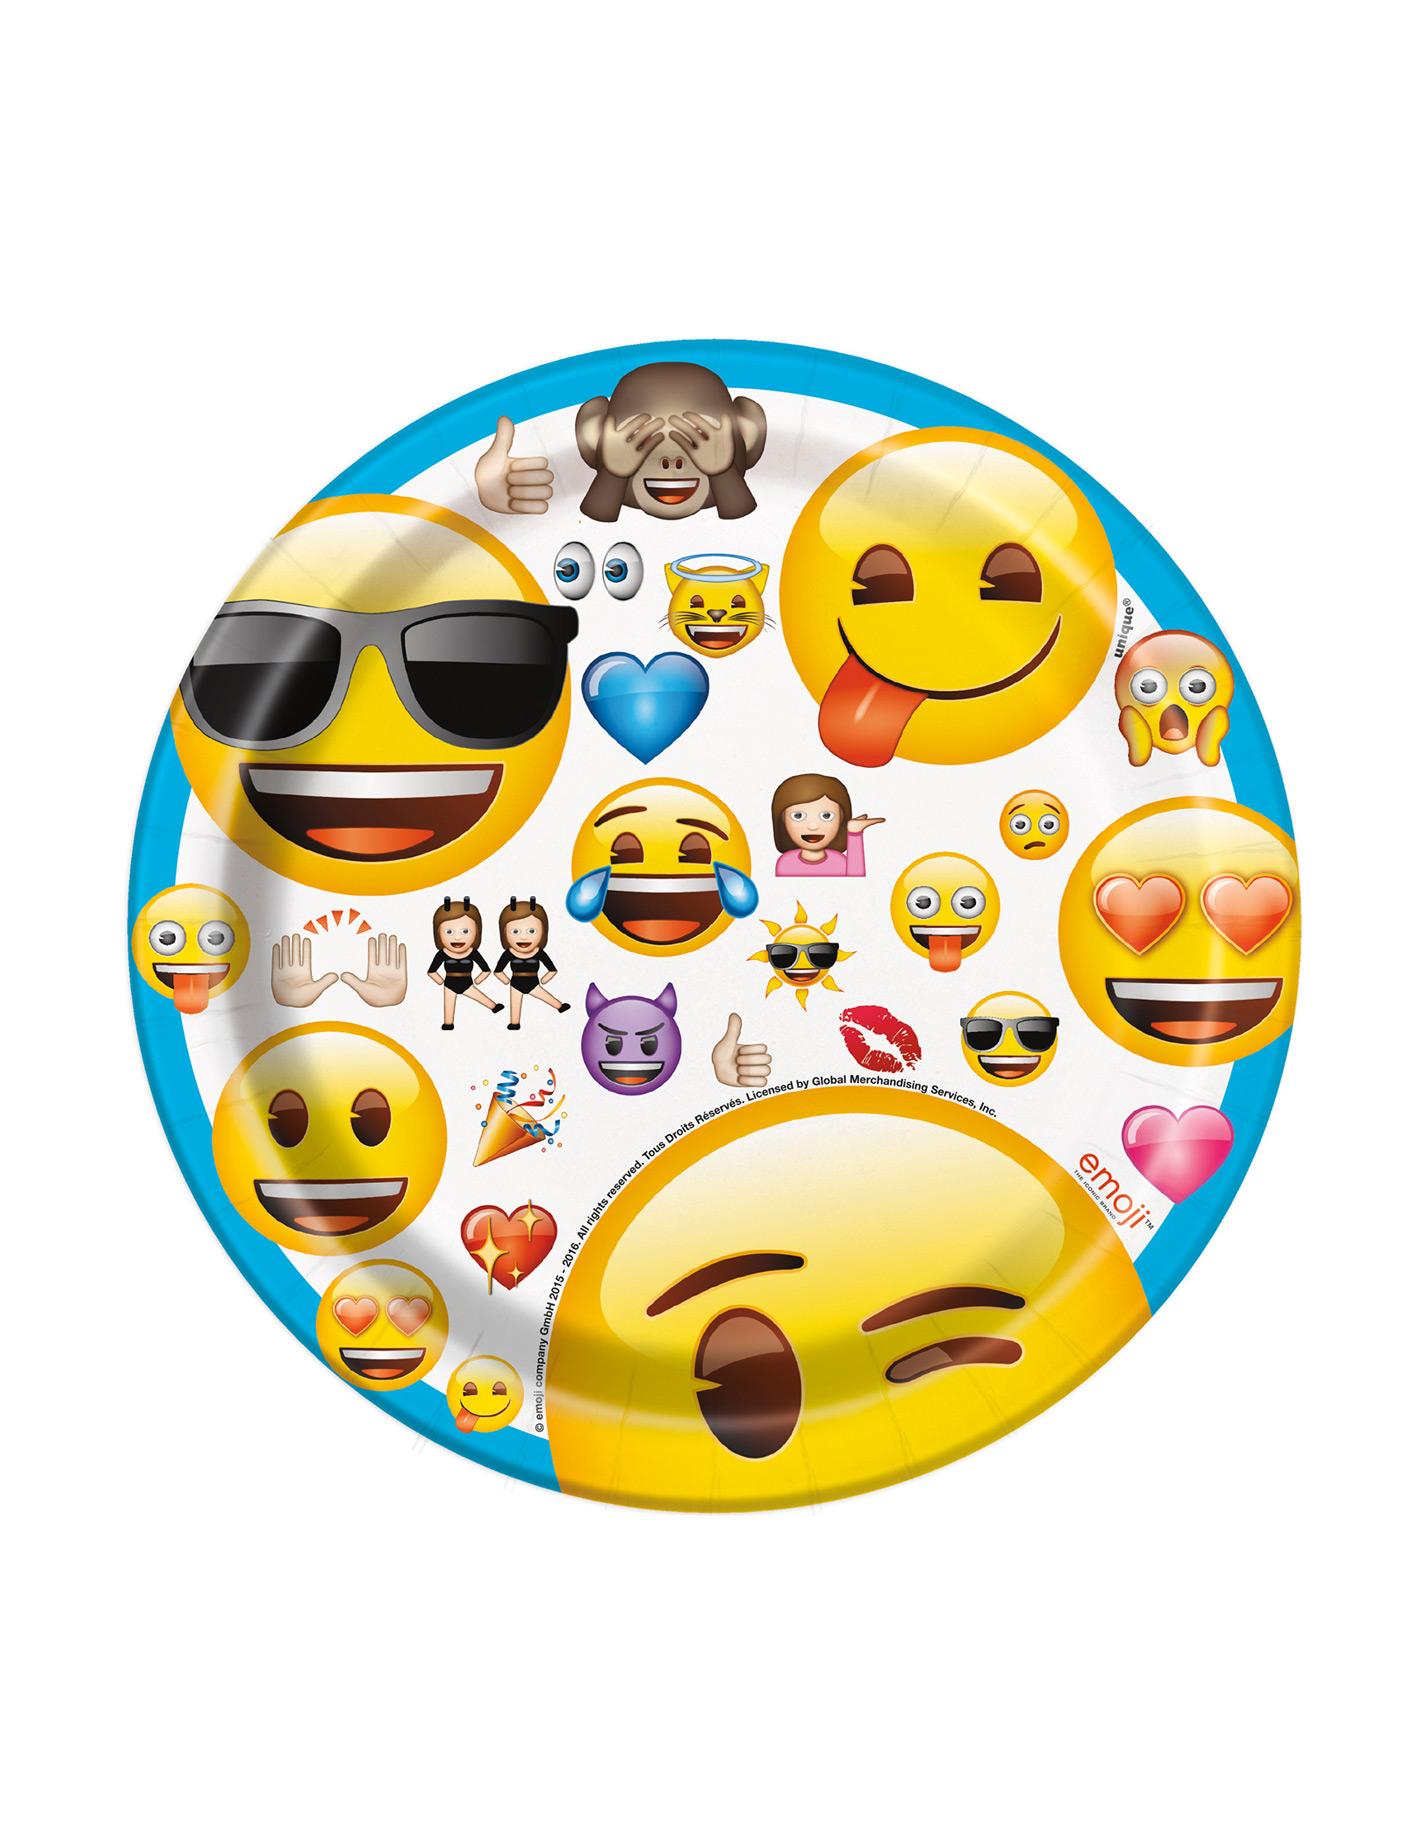 Partydeko Geburtstag Emoji Gunstige Deko Artikel Fur Gelungene